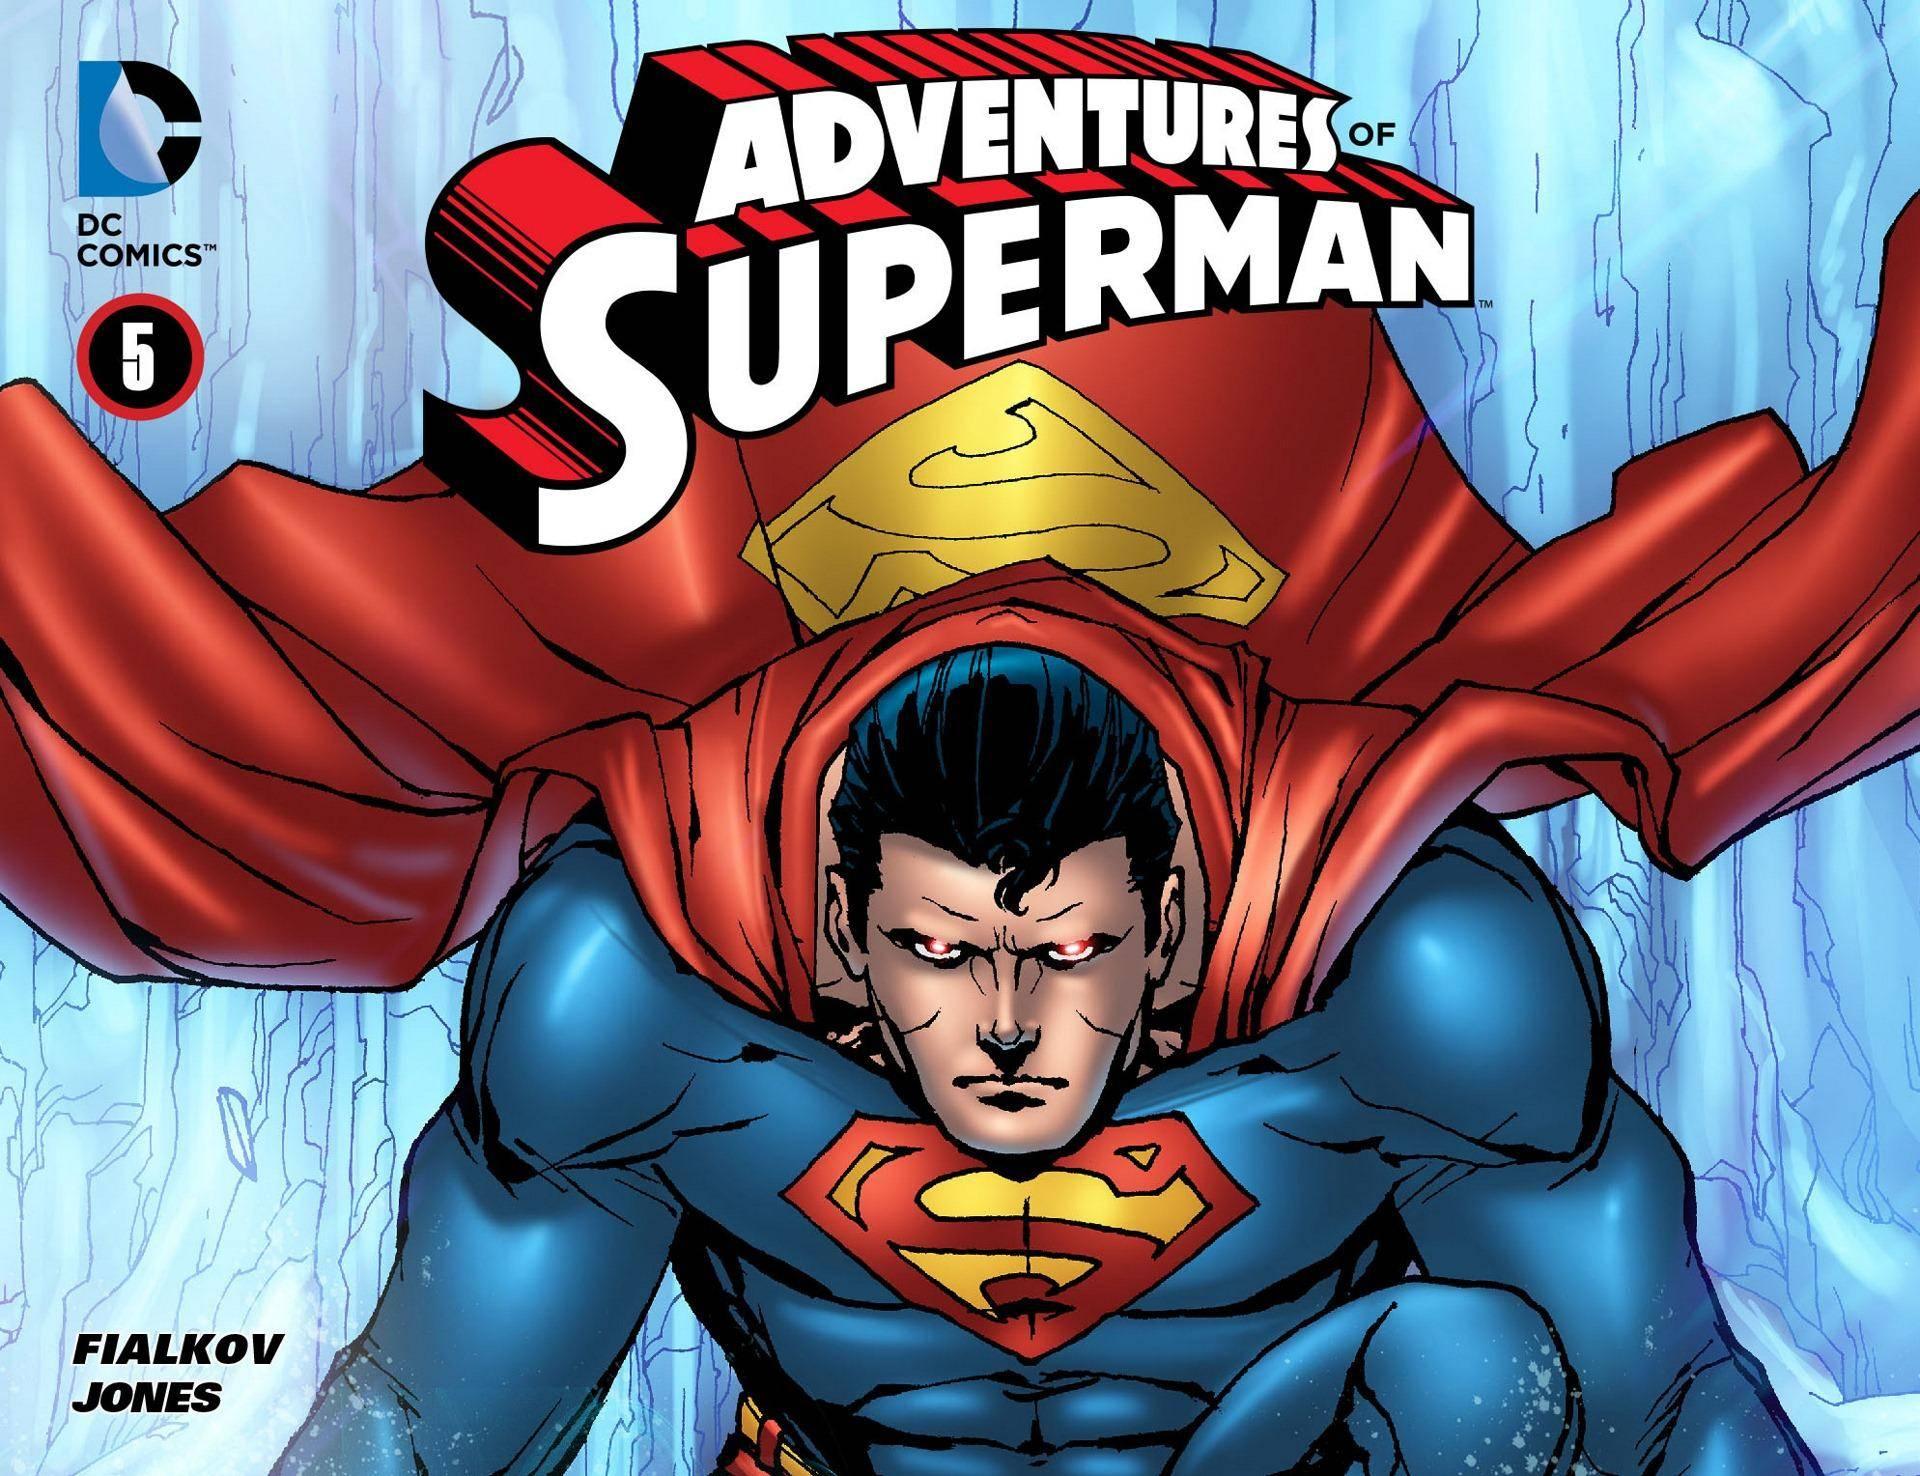 Adventures of Superman 005 2013 Digital